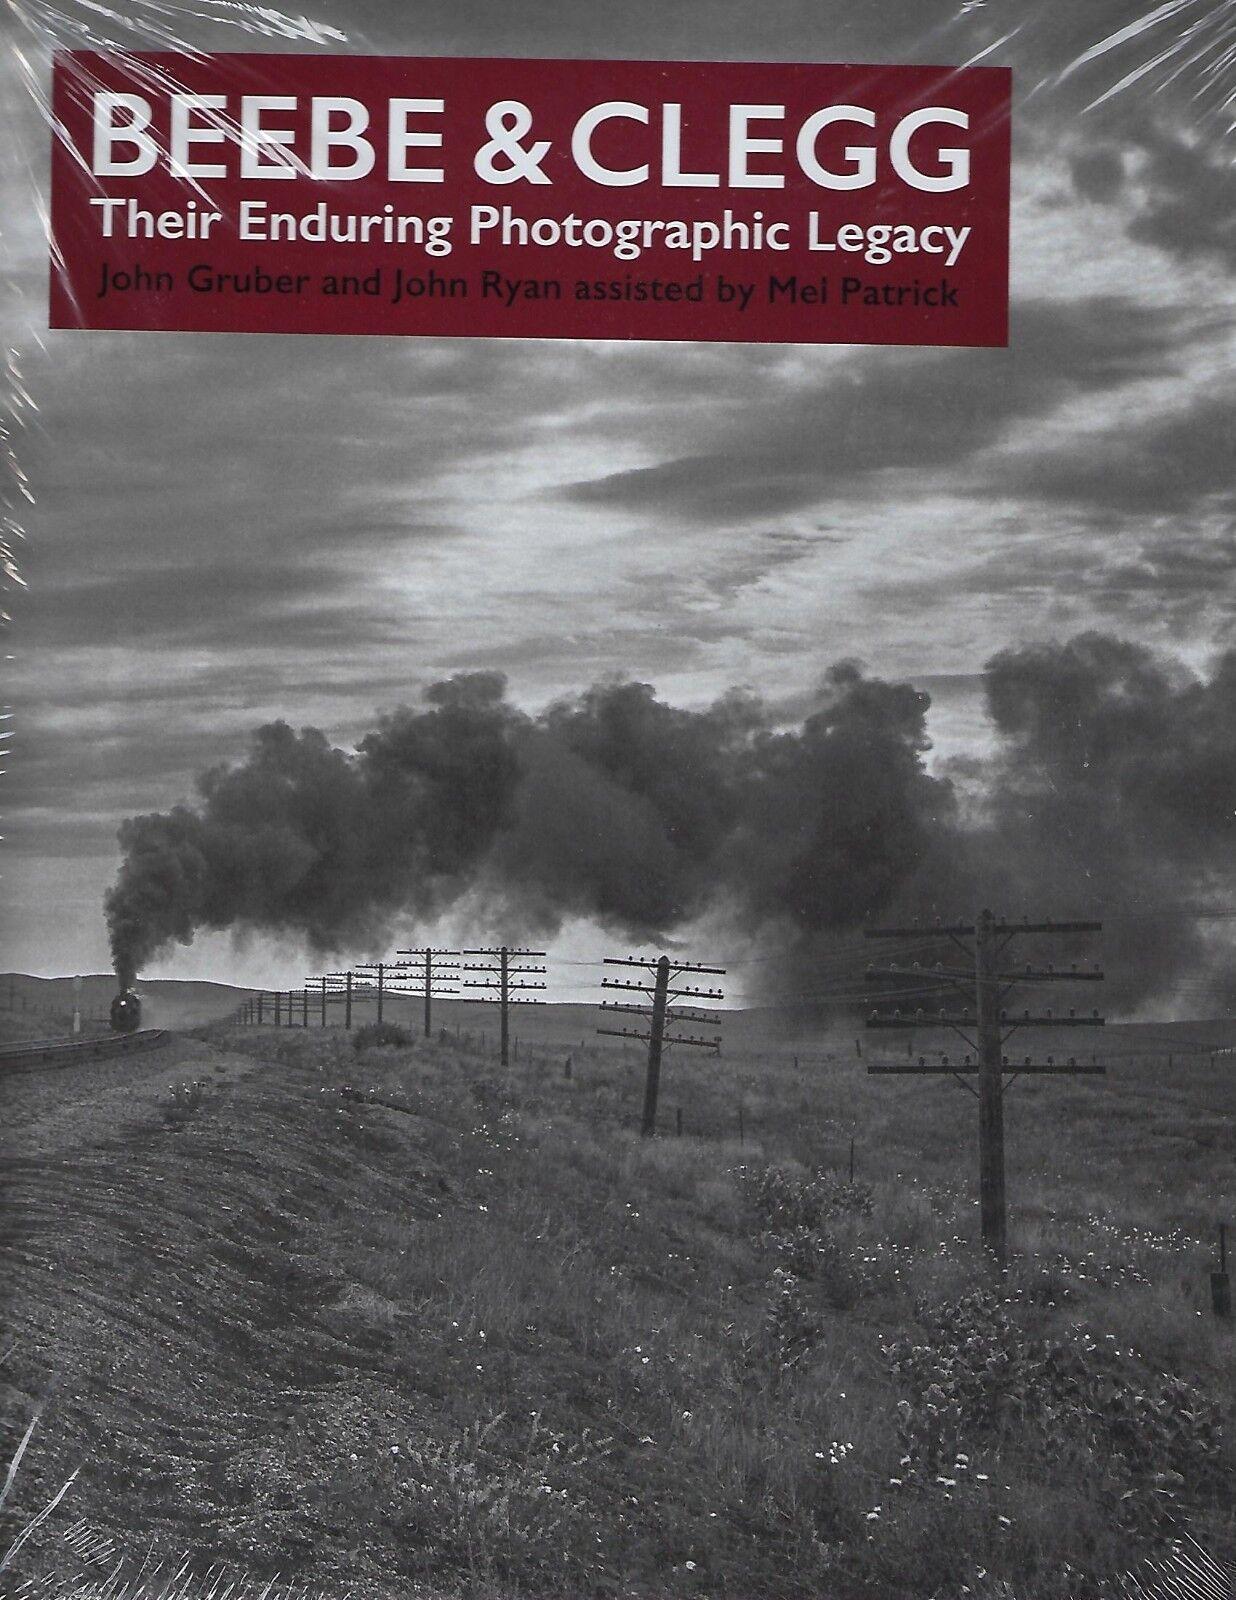 Beebe & Clegg - Loro Enduring Ferrovia Fotografico Legacy  Nuovo Libro